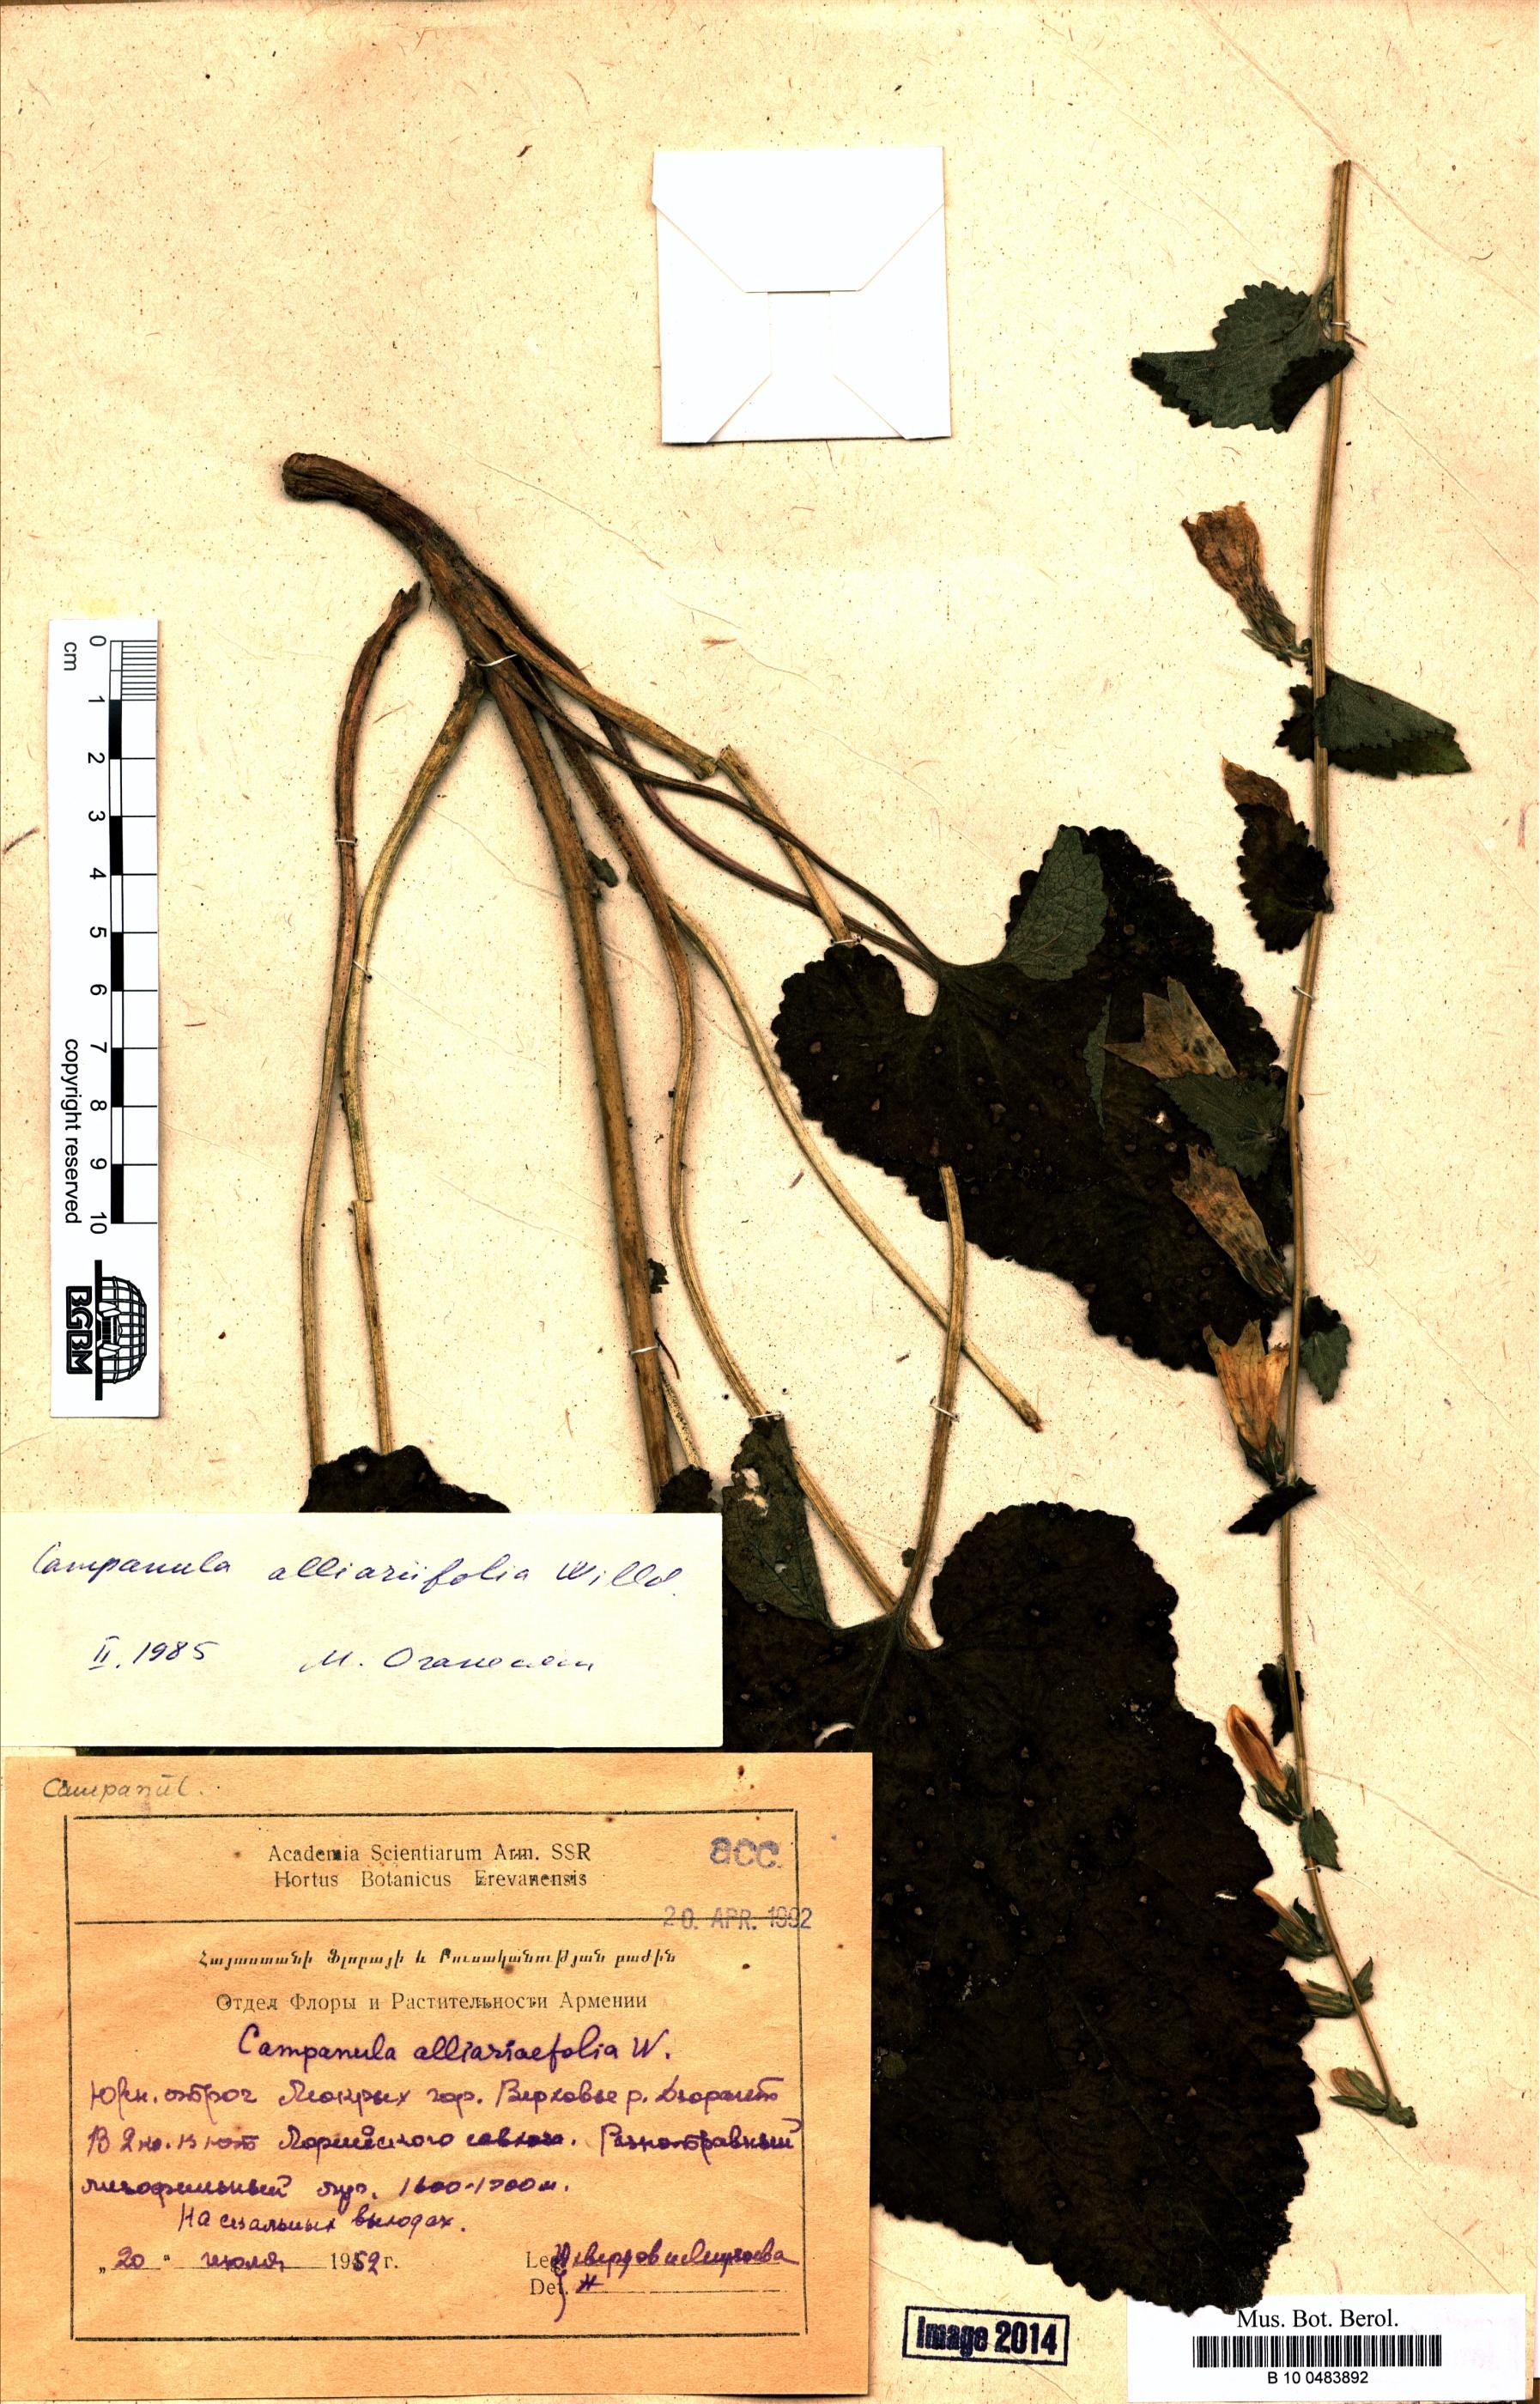 http://ww2.bgbm.org/herbarium/images/B/10/04/83/89/B_10_0483892.jpg